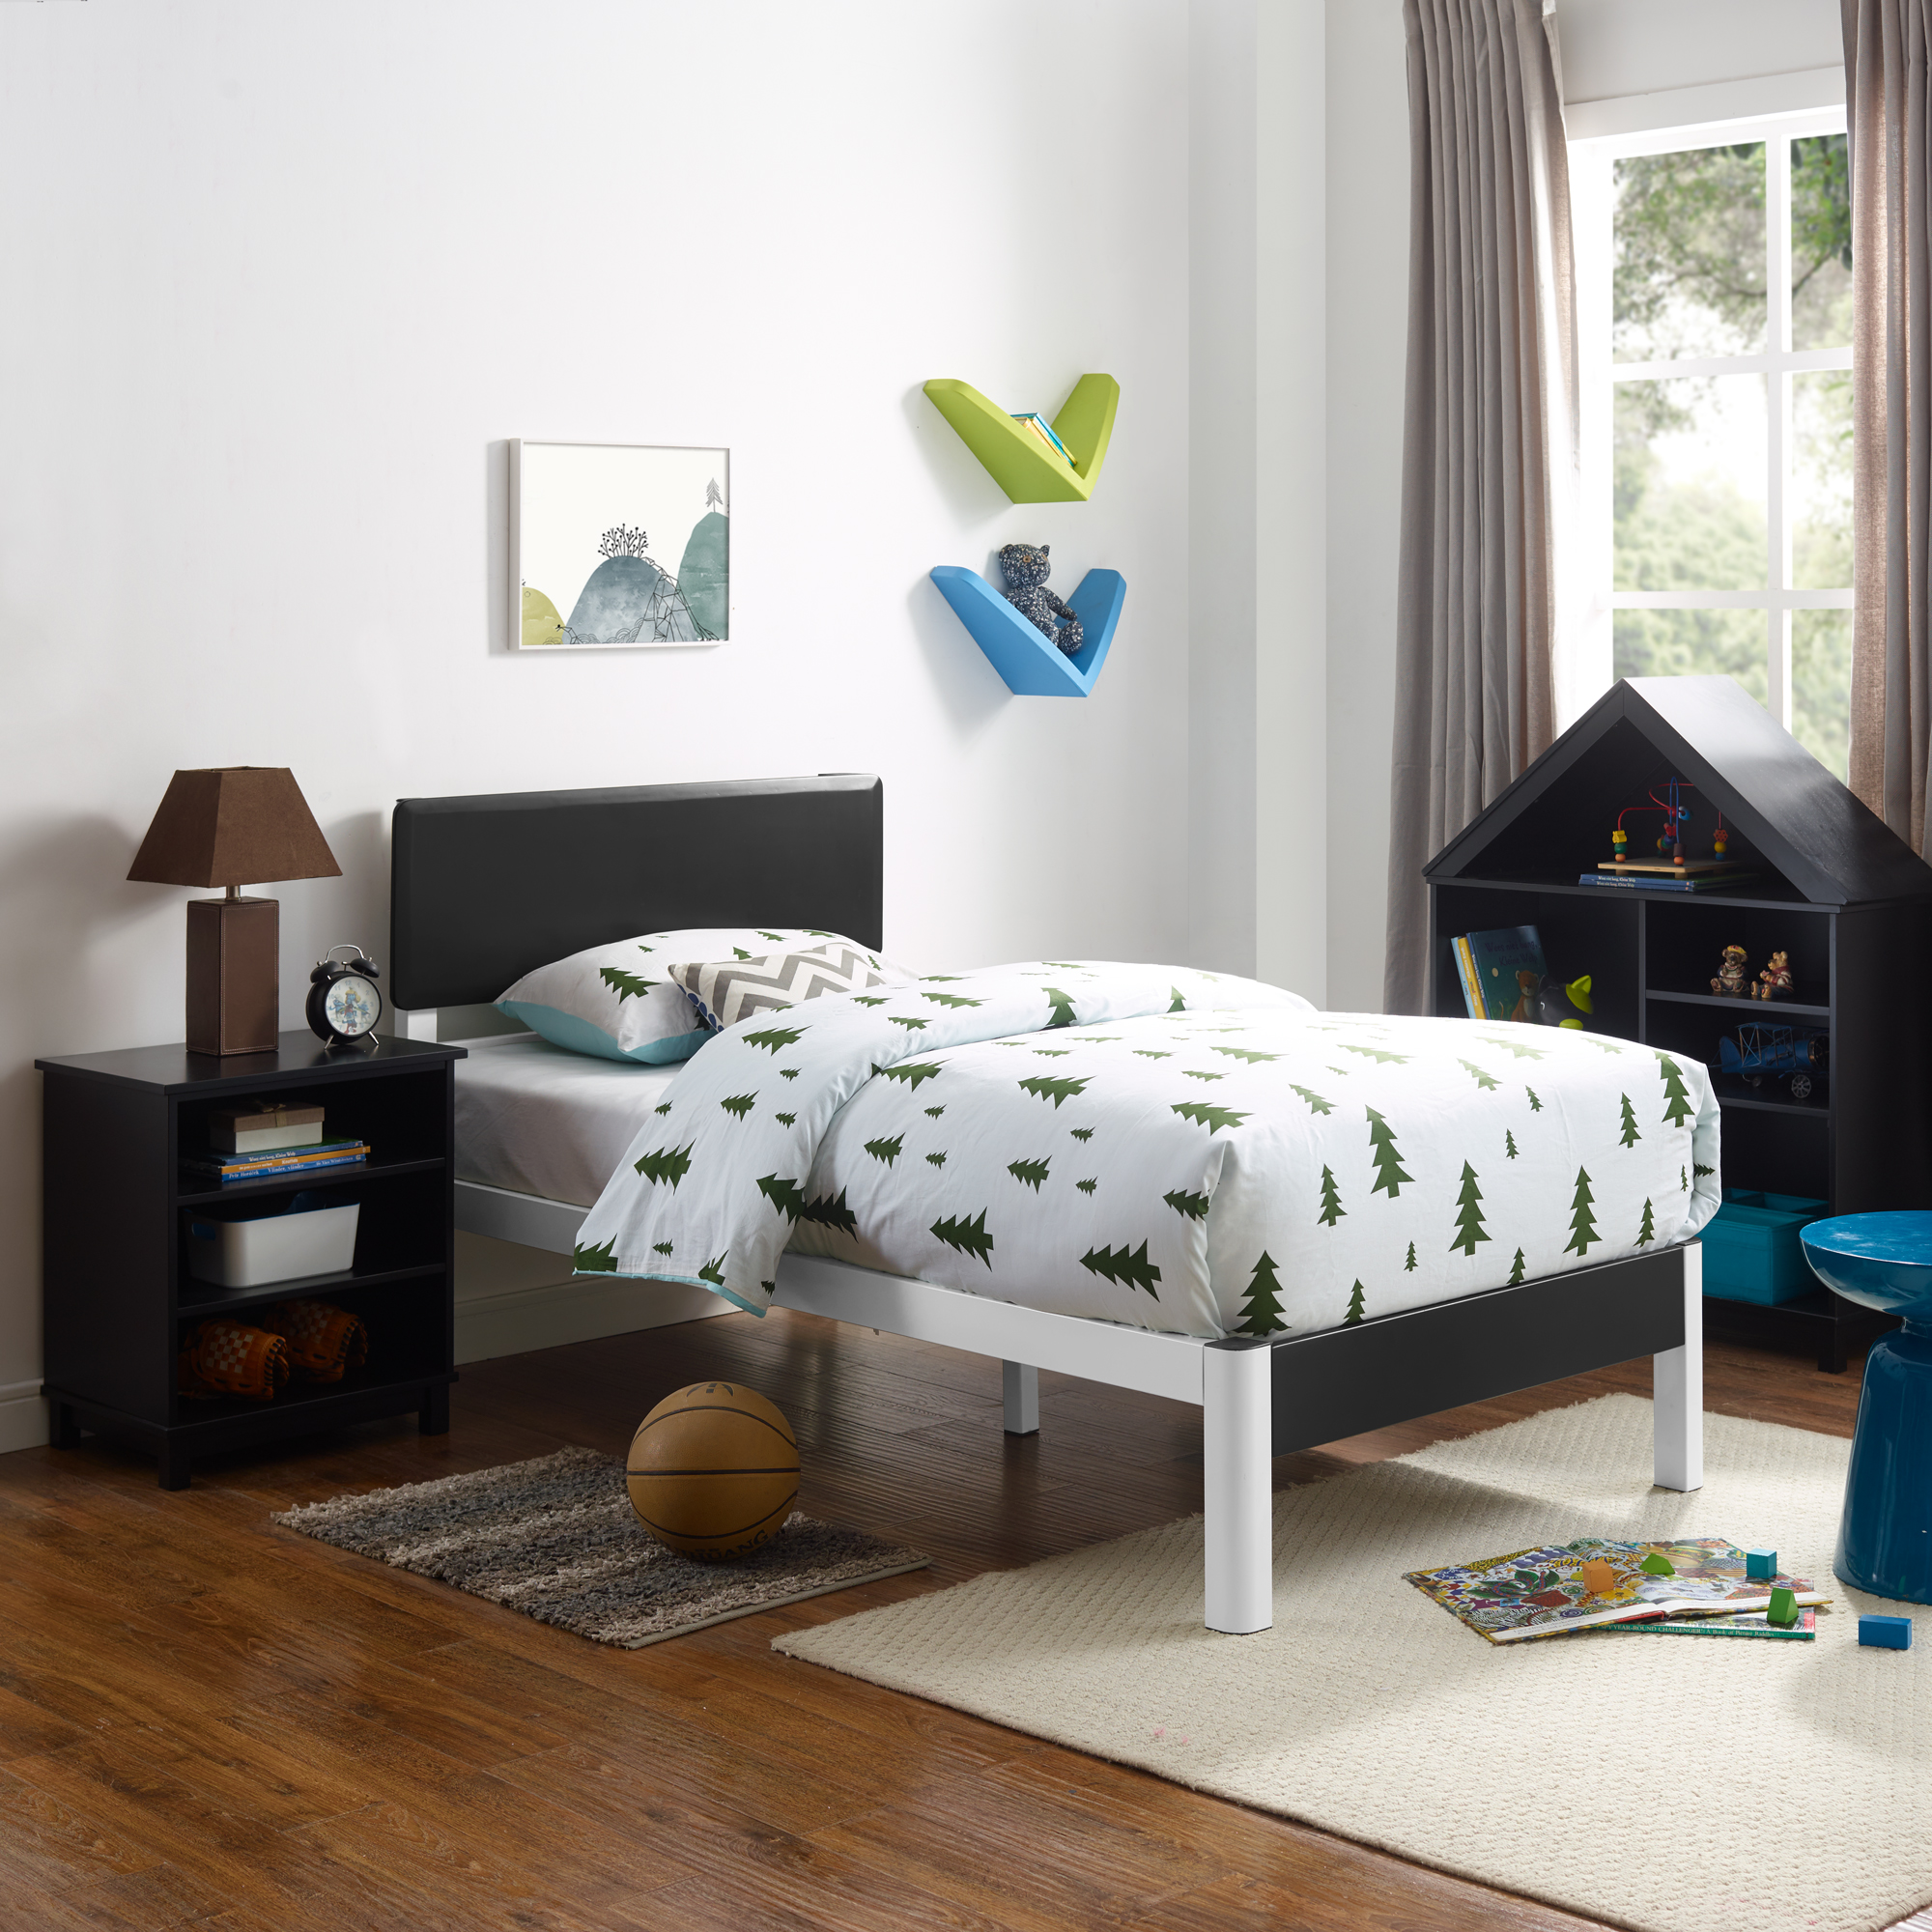 Modern Sleep Polina Wood Slat And White Metal Platform Bed Frame With Solid Wood Black Headboard Mattress Foundation Twin Walmart Com Walmart Com